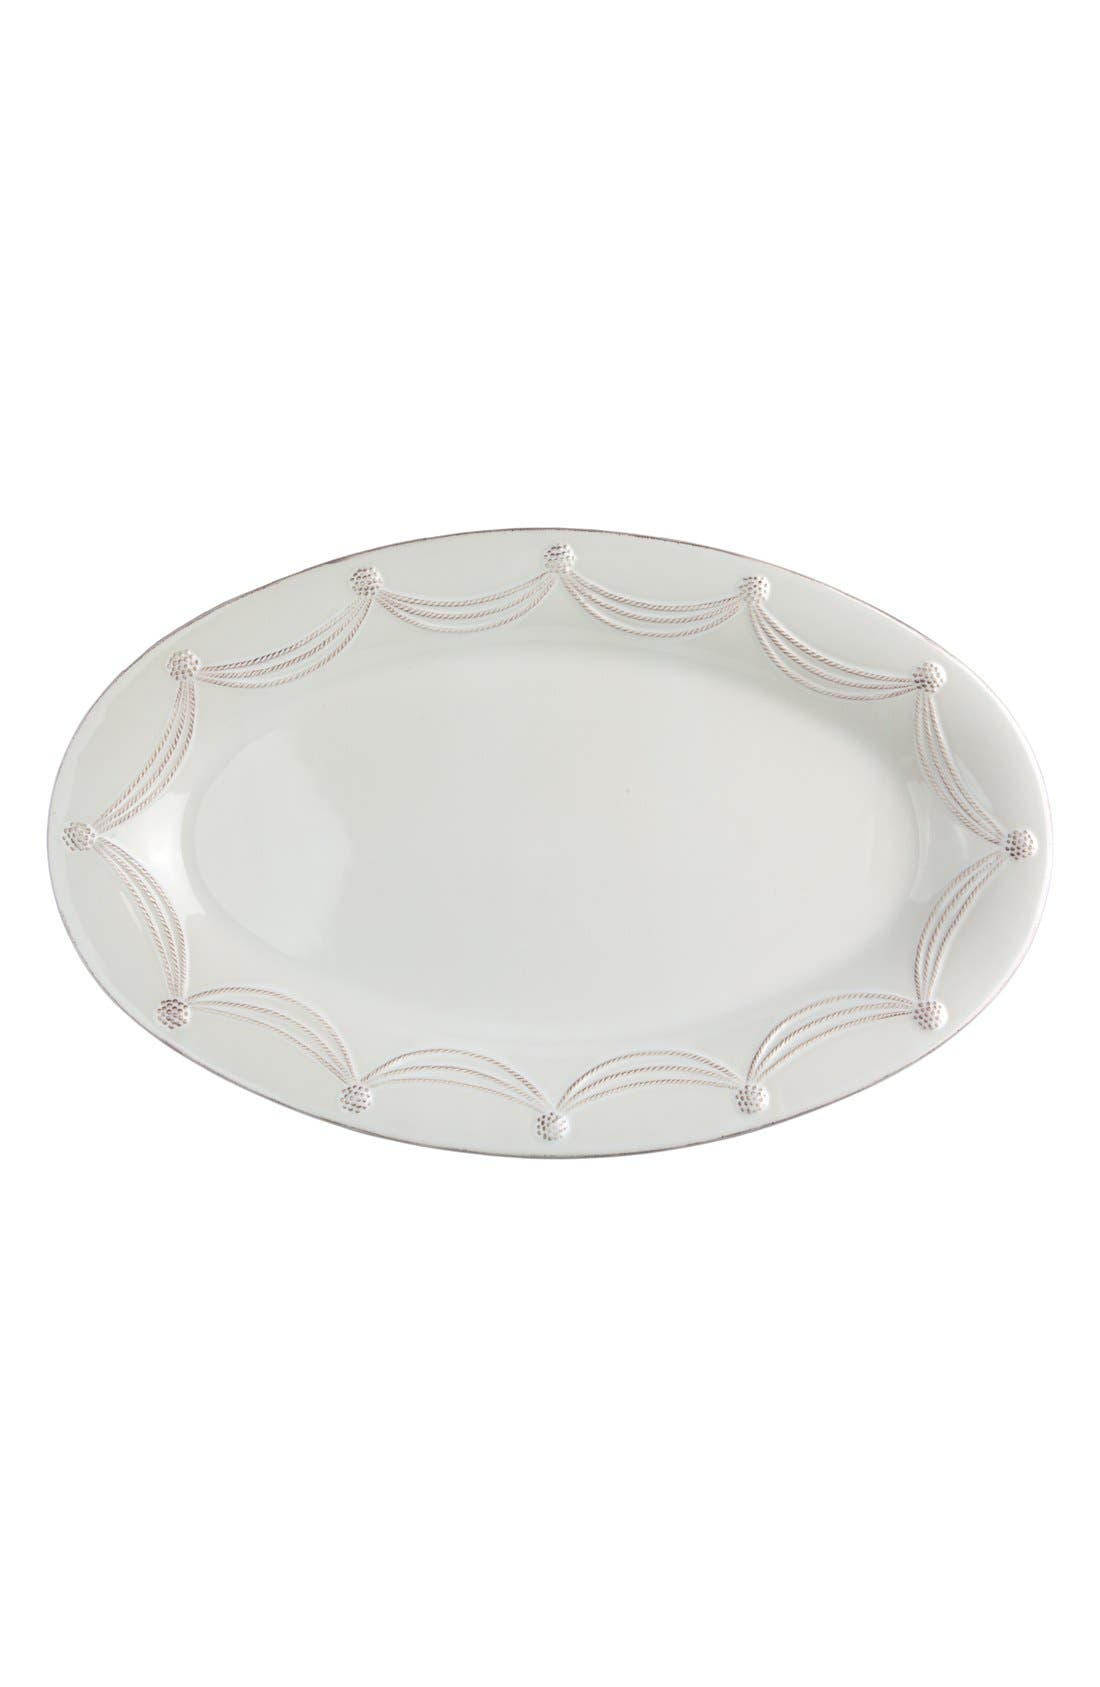 Main Image - Juliska 'Berry and Thread' Oval Platter